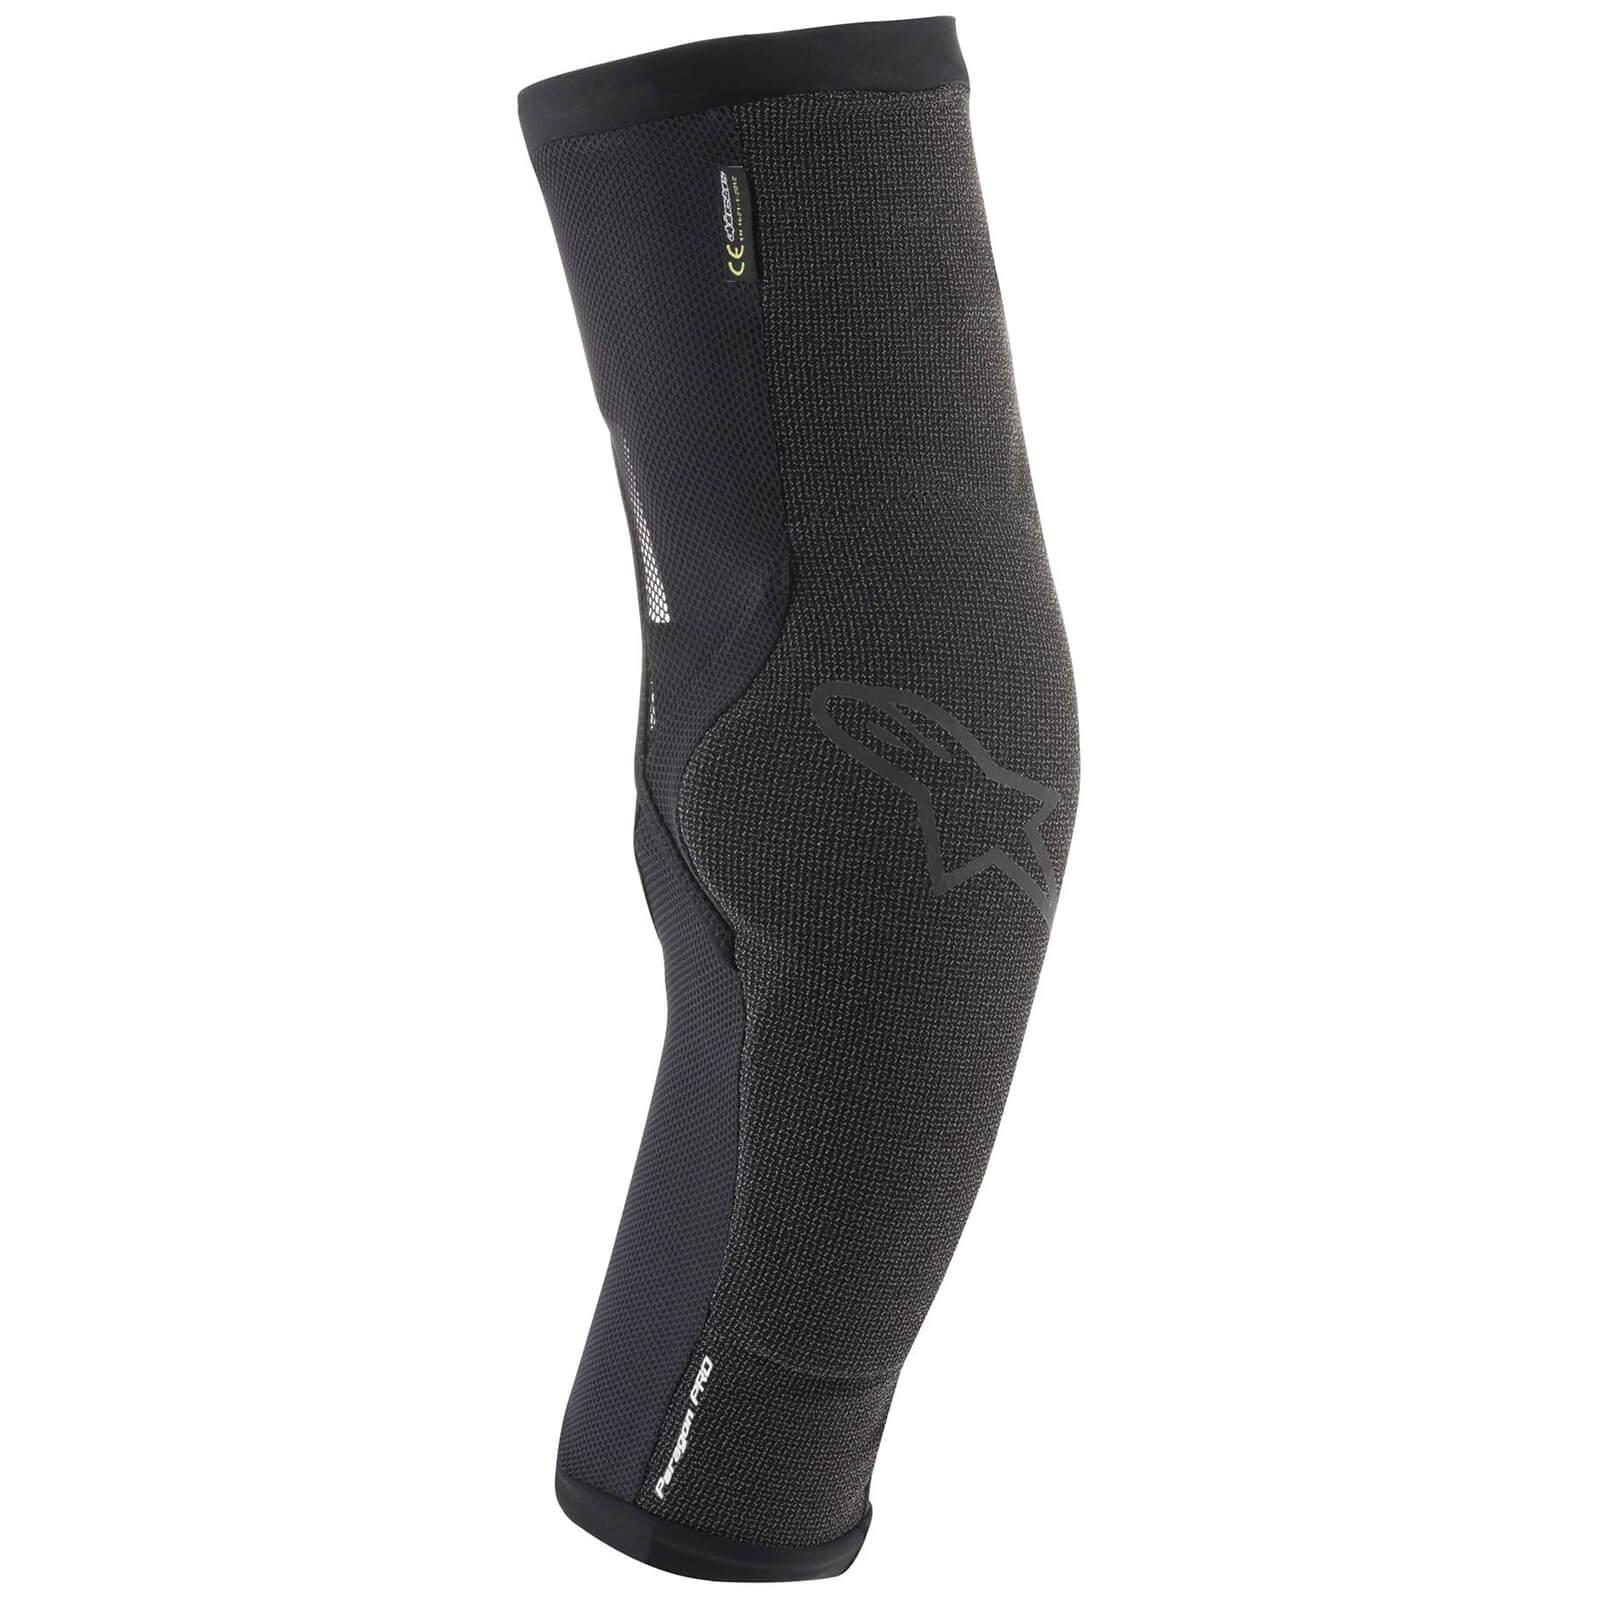 Alpinestars Paragon Pro MTB Knee Protector - XXS